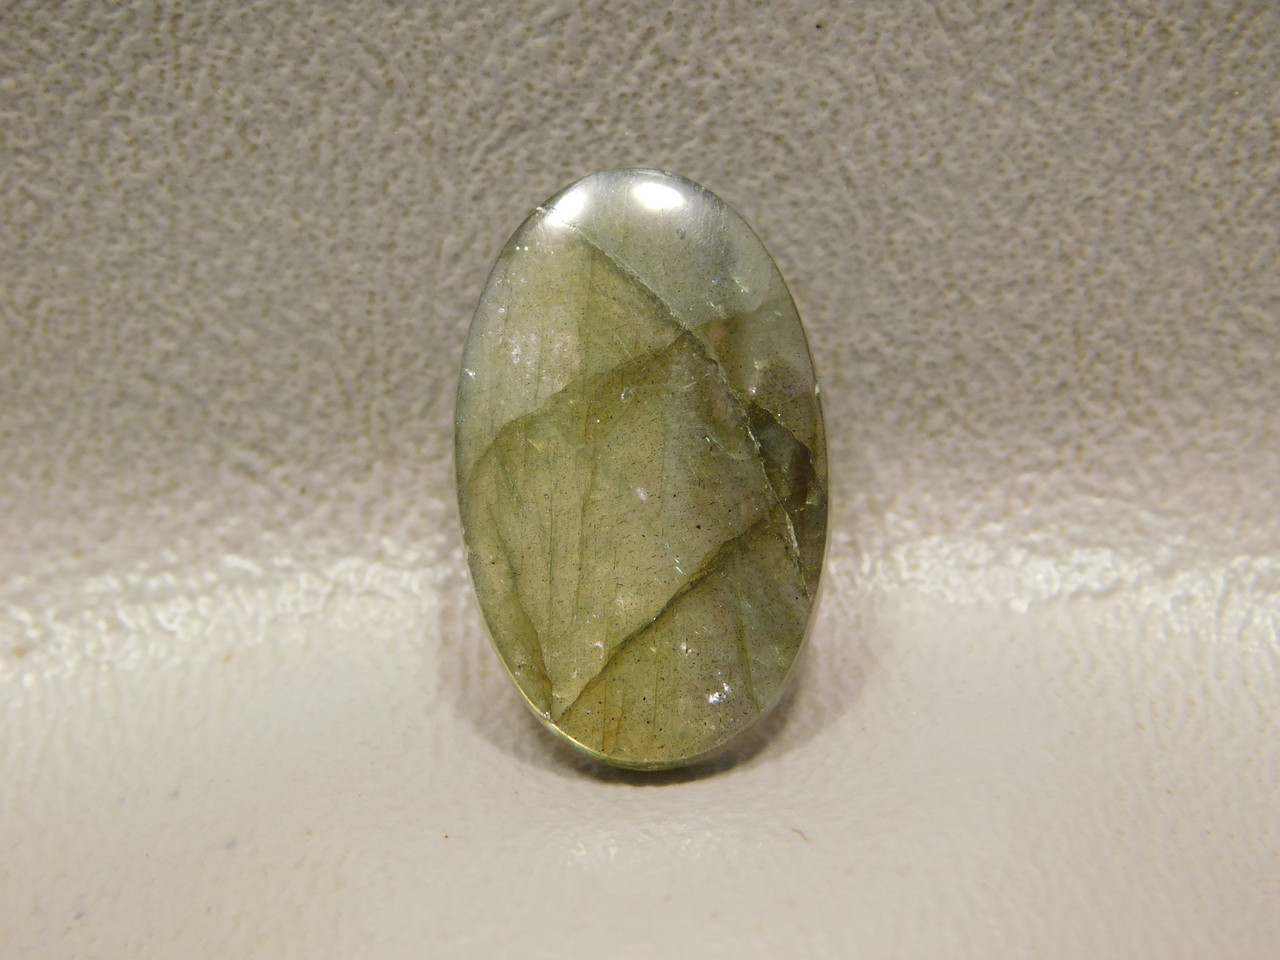 Rainbow Labradorite Cabochon Jewelry Ring Sized Stone #5